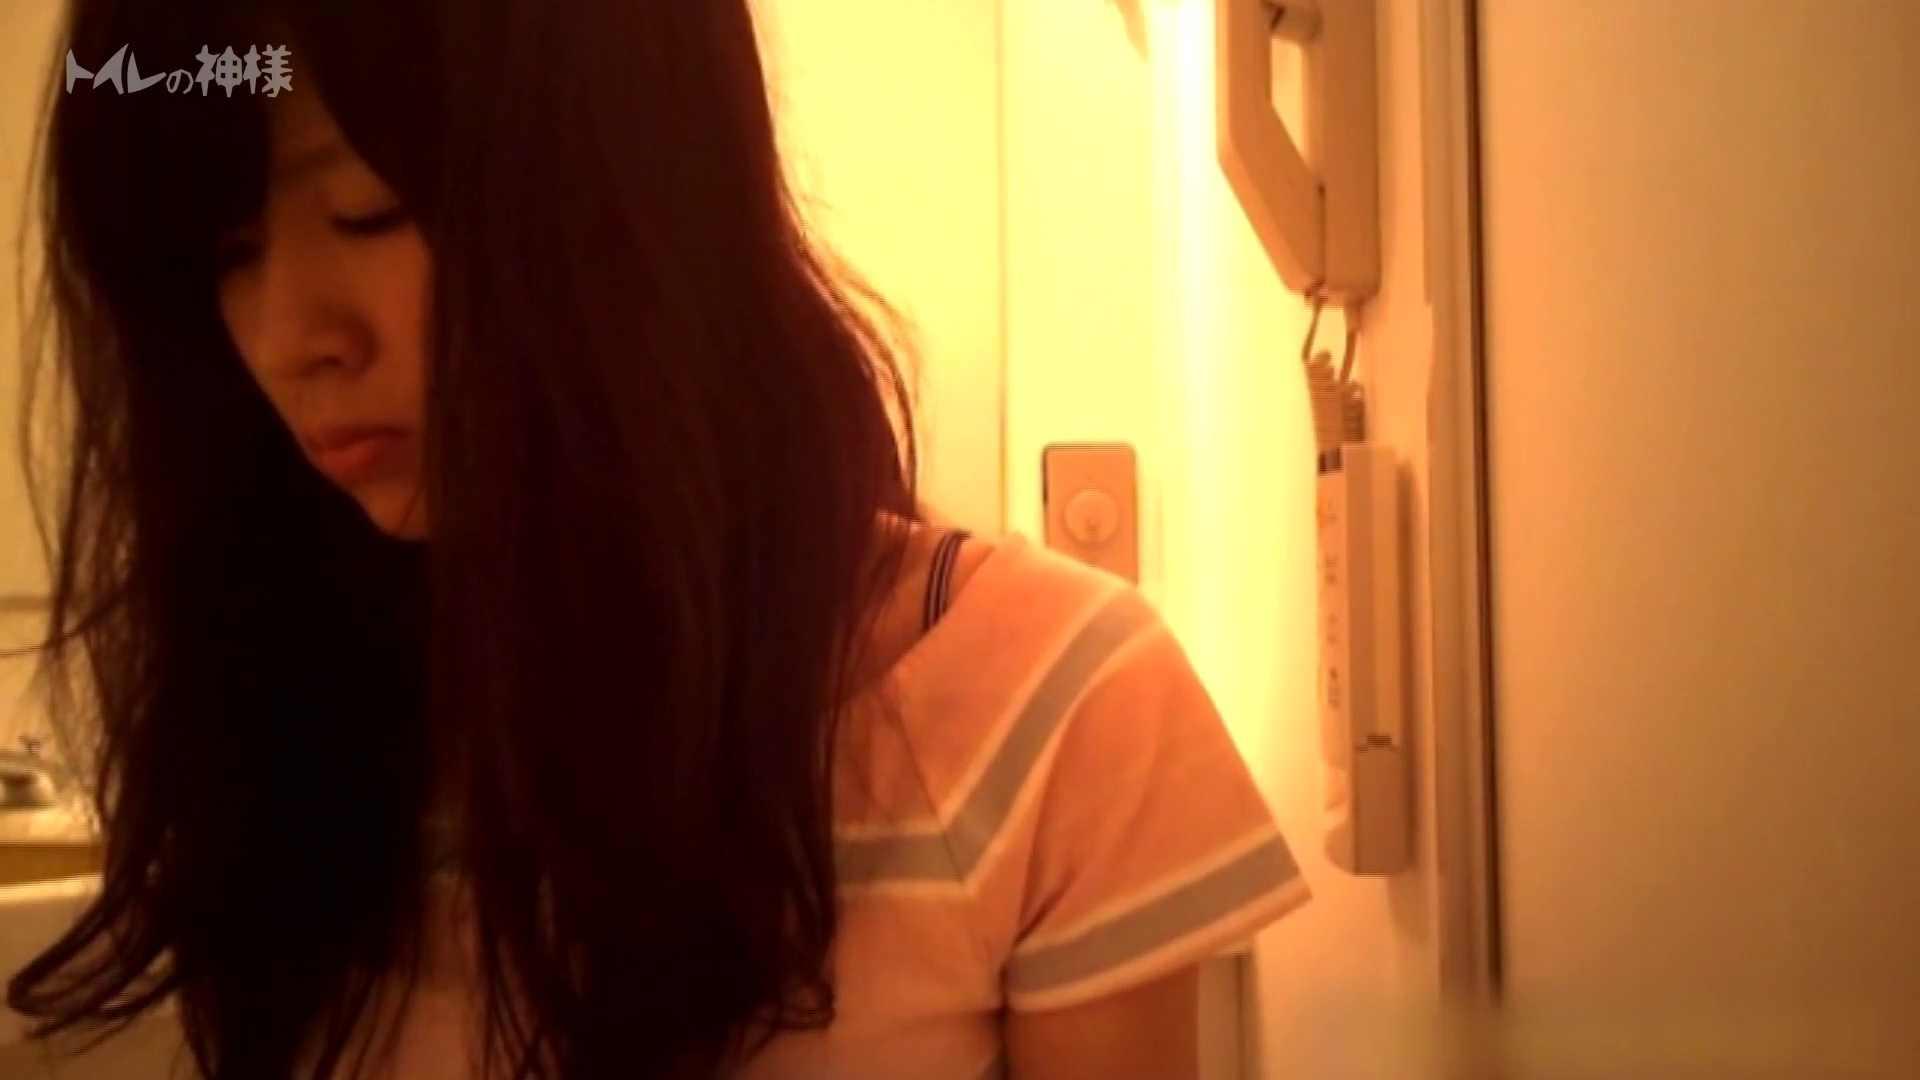 Vol.04 女子大生のトイレ恥態 トイレ盗撮 | 丸見え  92枚 49